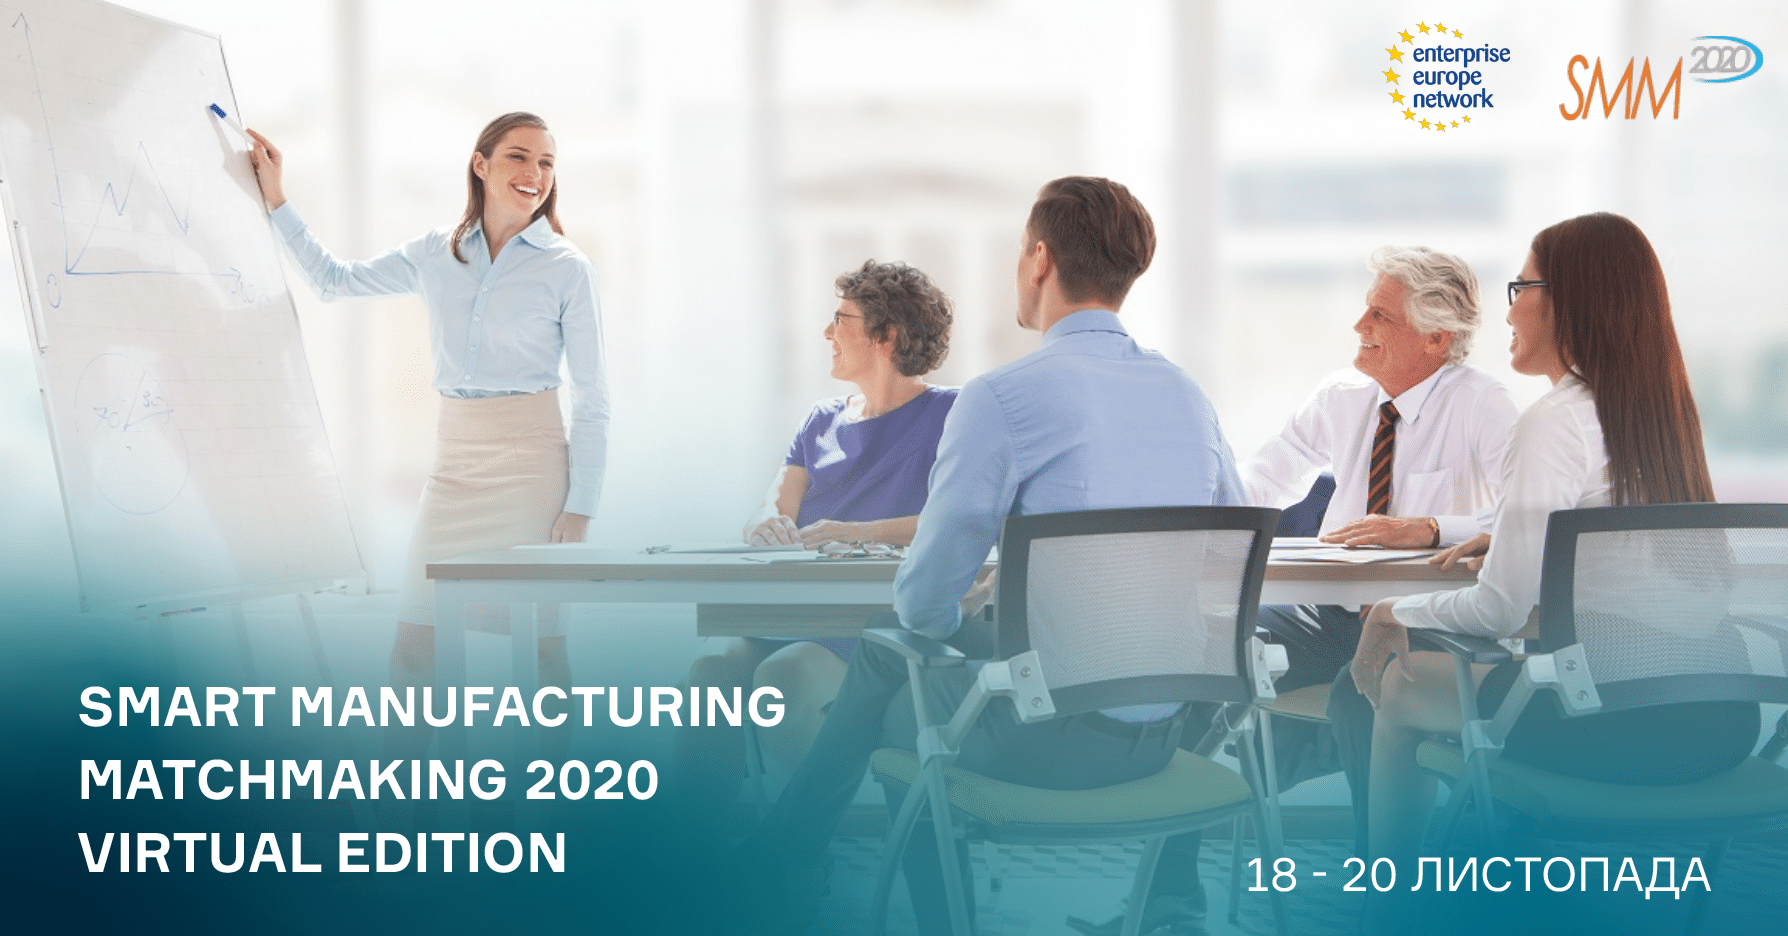 Міжнародний брокерський захід Smart Manufacturing Matchmaking 2020 Virtual Edition